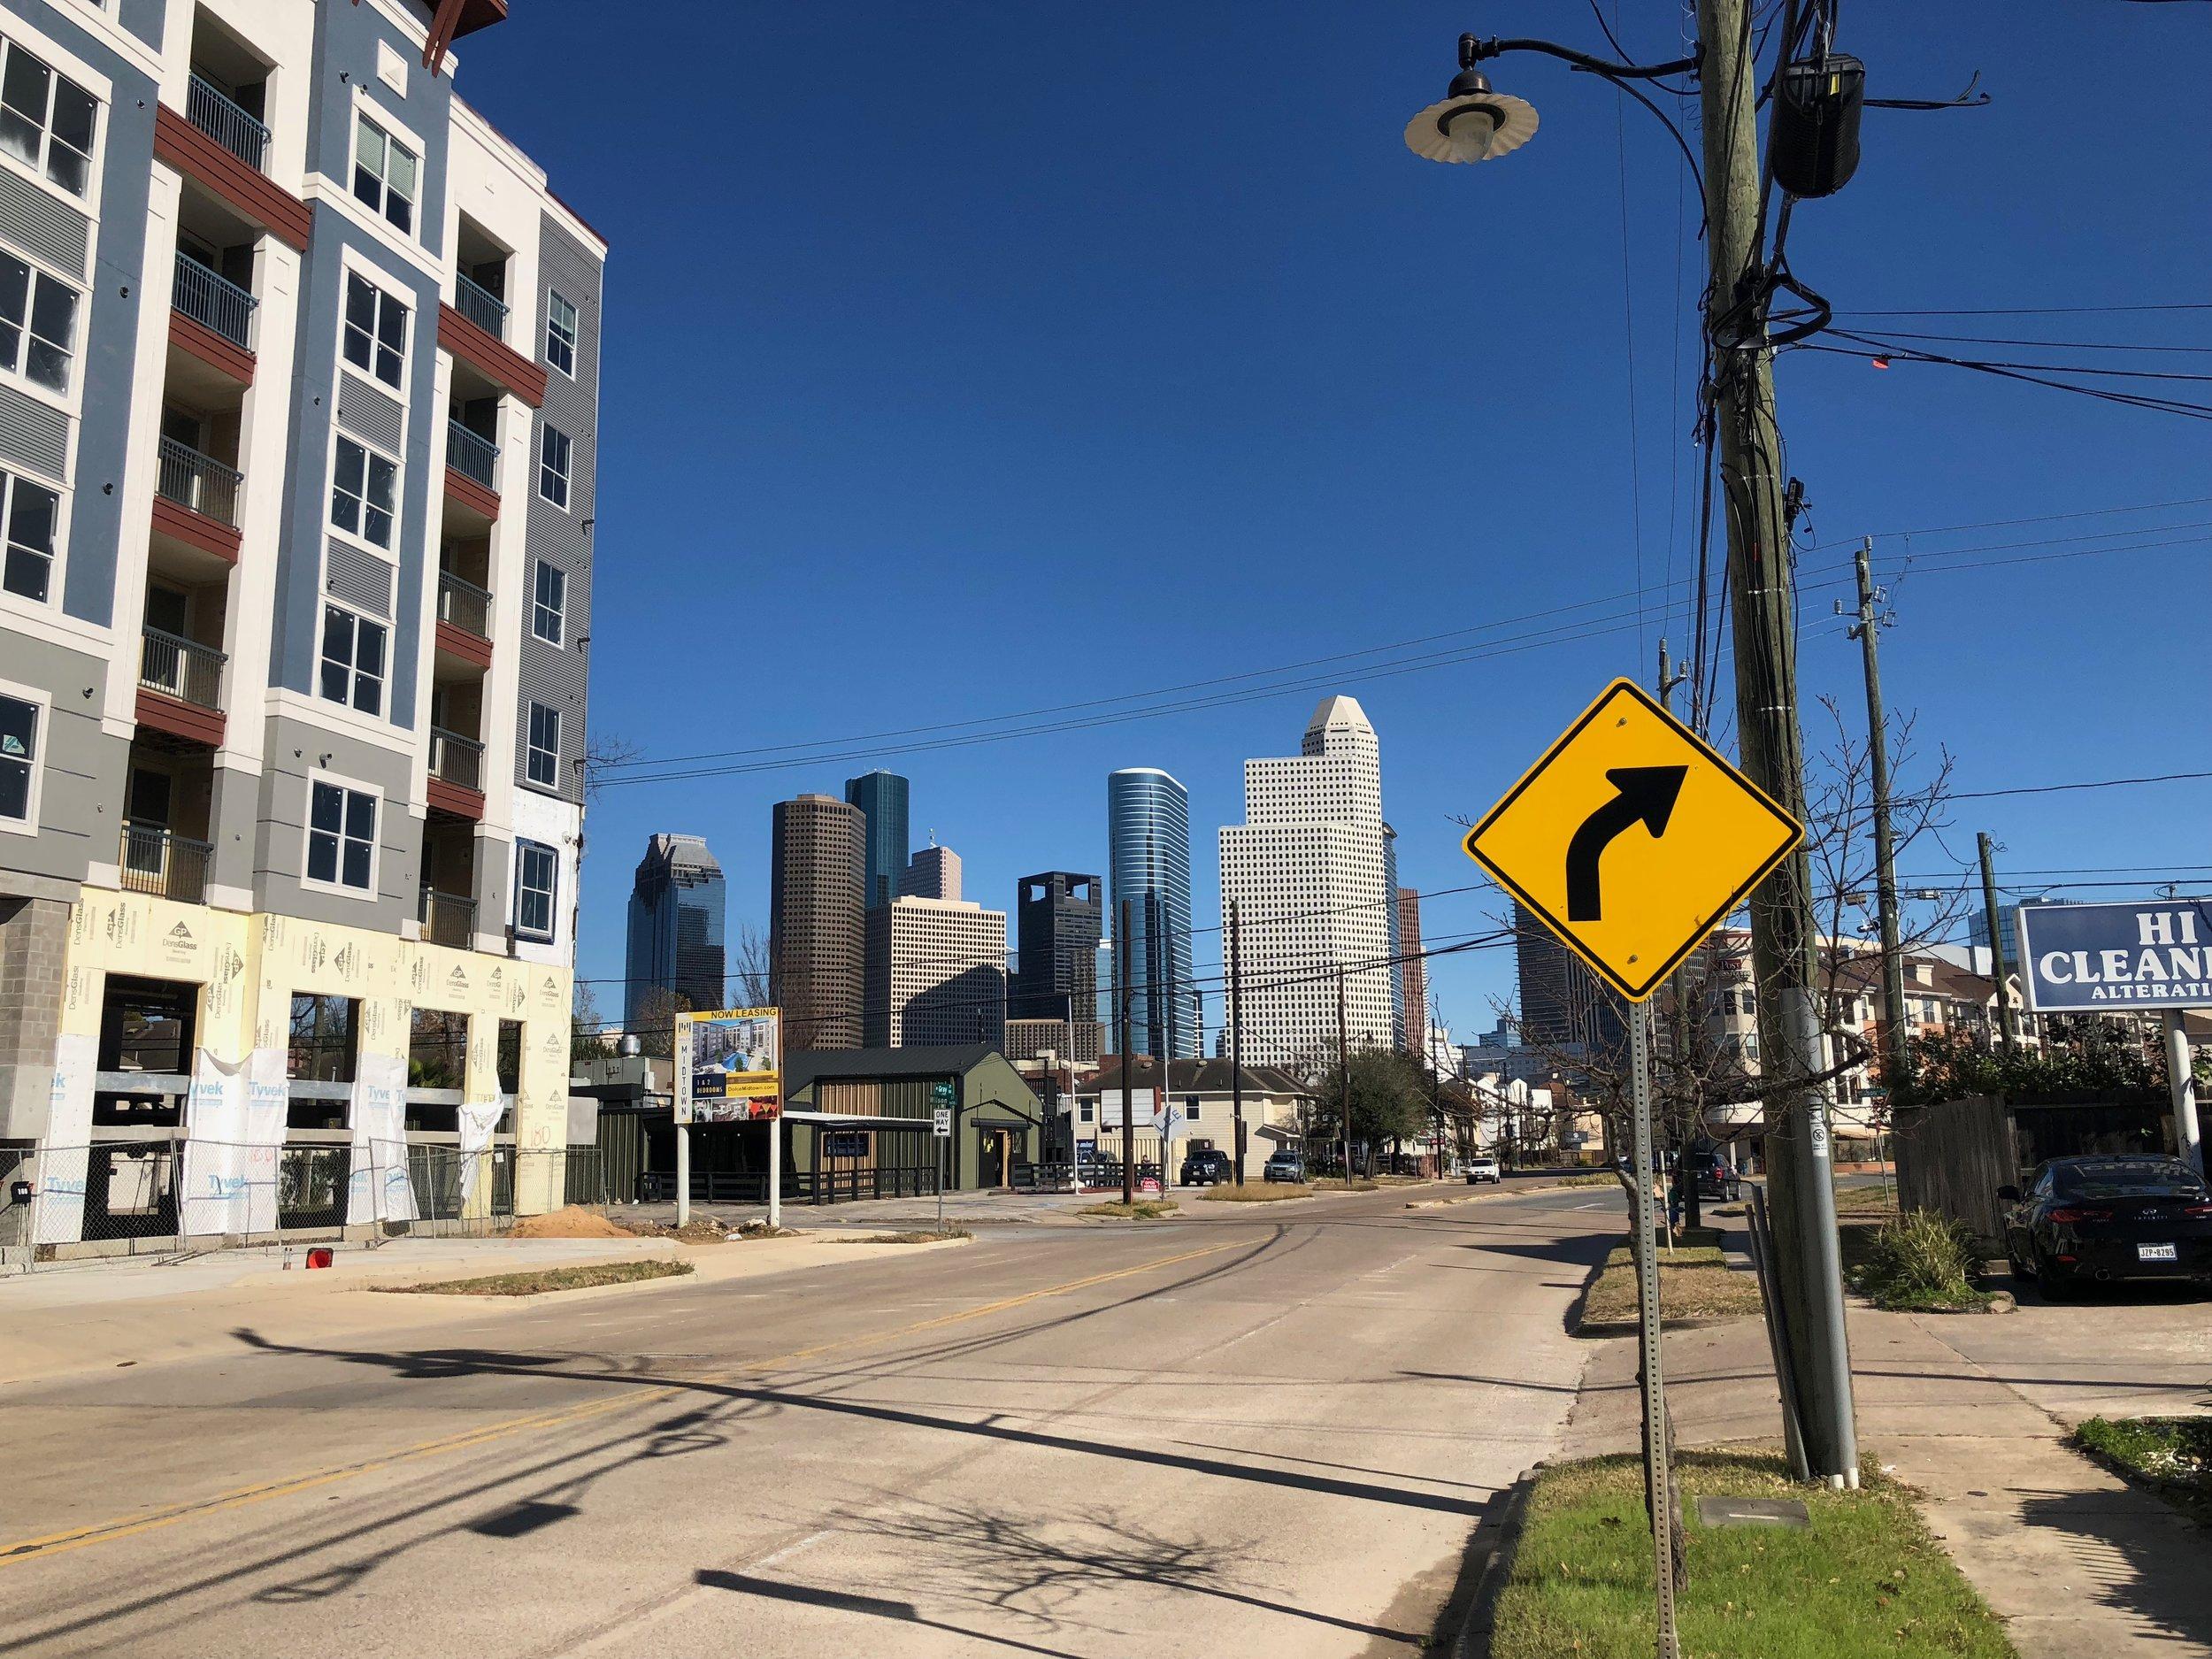 West Gray Street